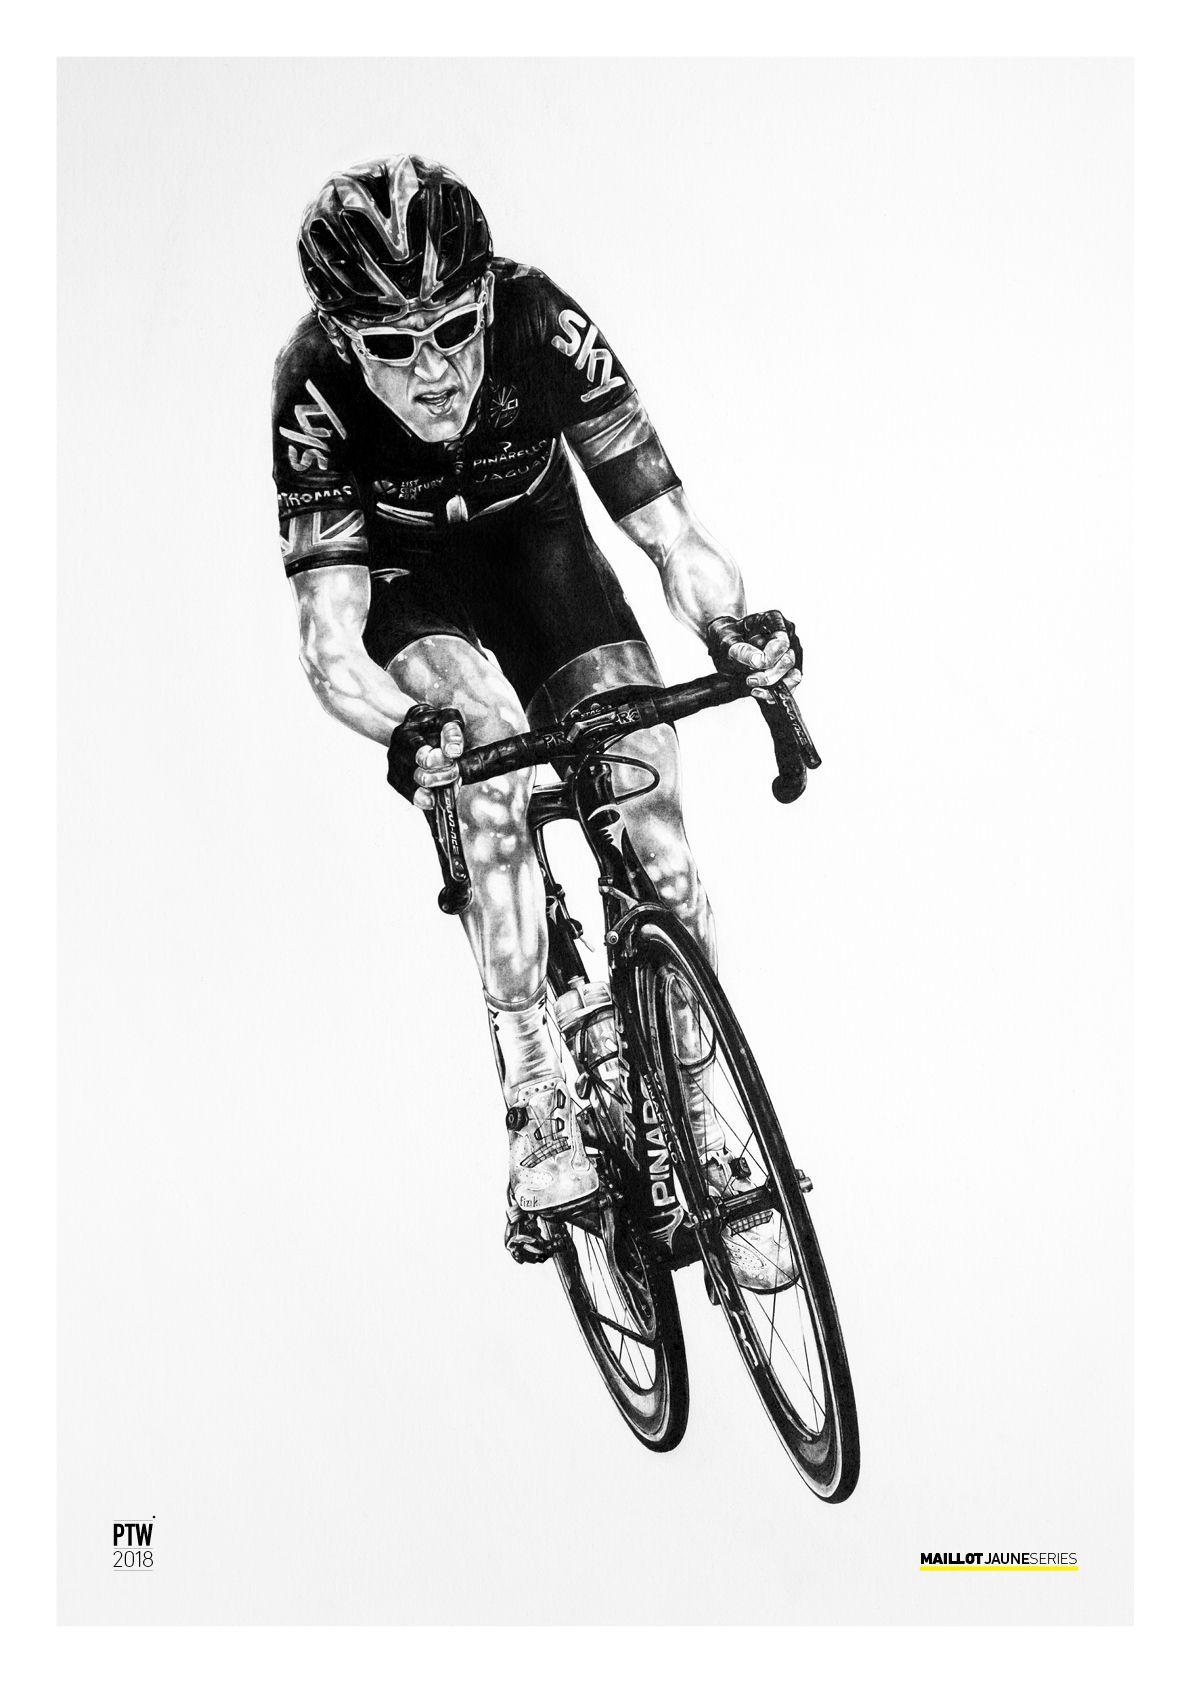 Cancellara Cavendish Merckx Cycling A2 limited edition art prints Sagan